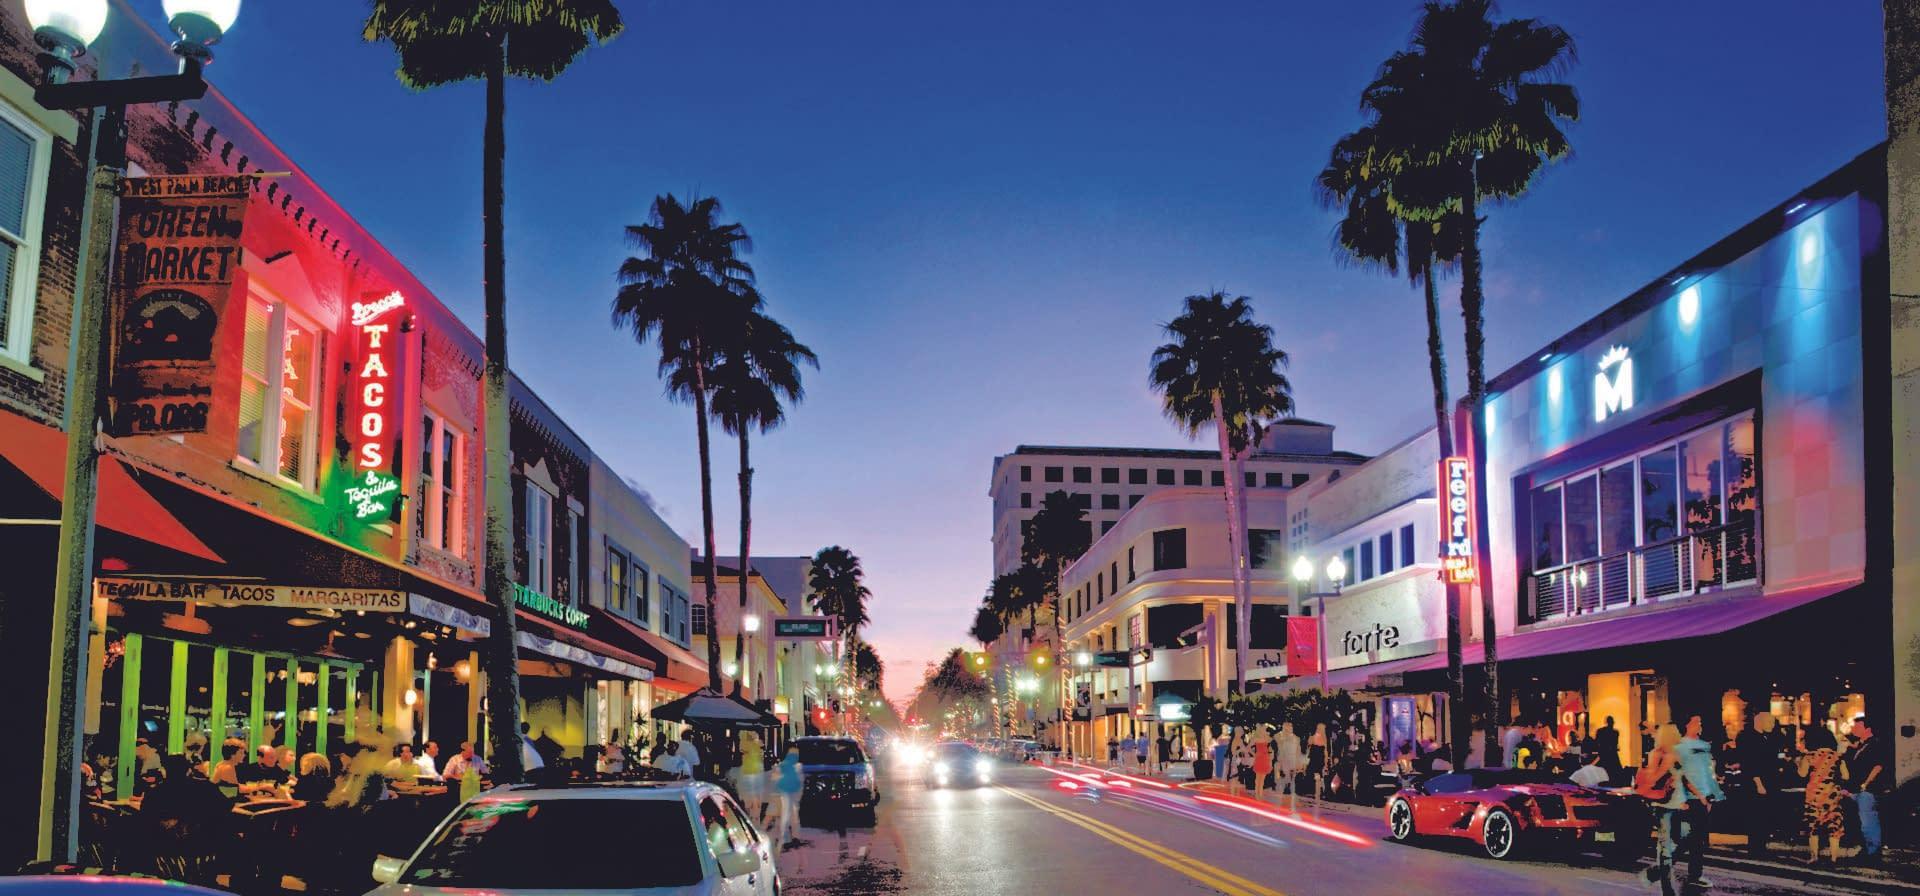 Image Of Down Town Palm Beach FL